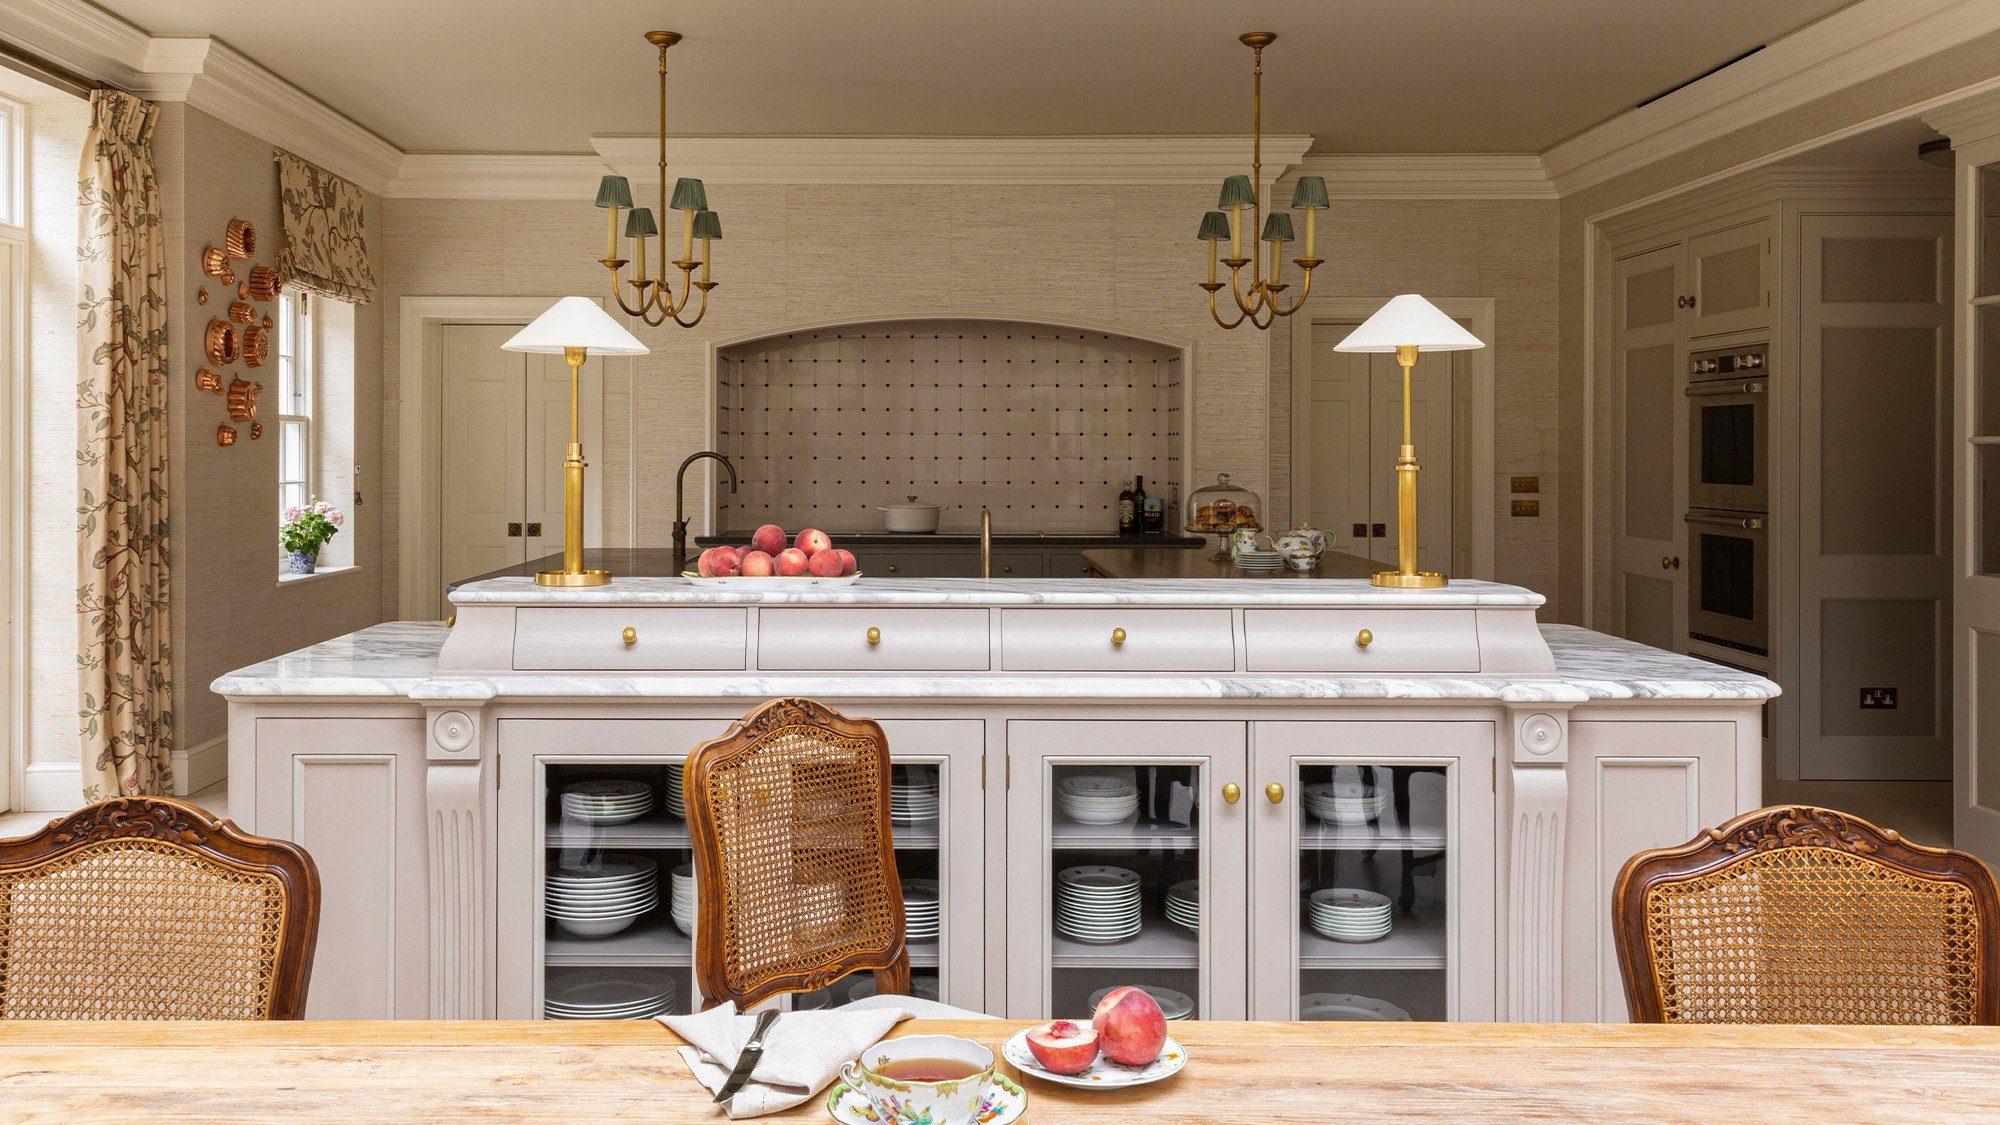 Regency style English kitchen island